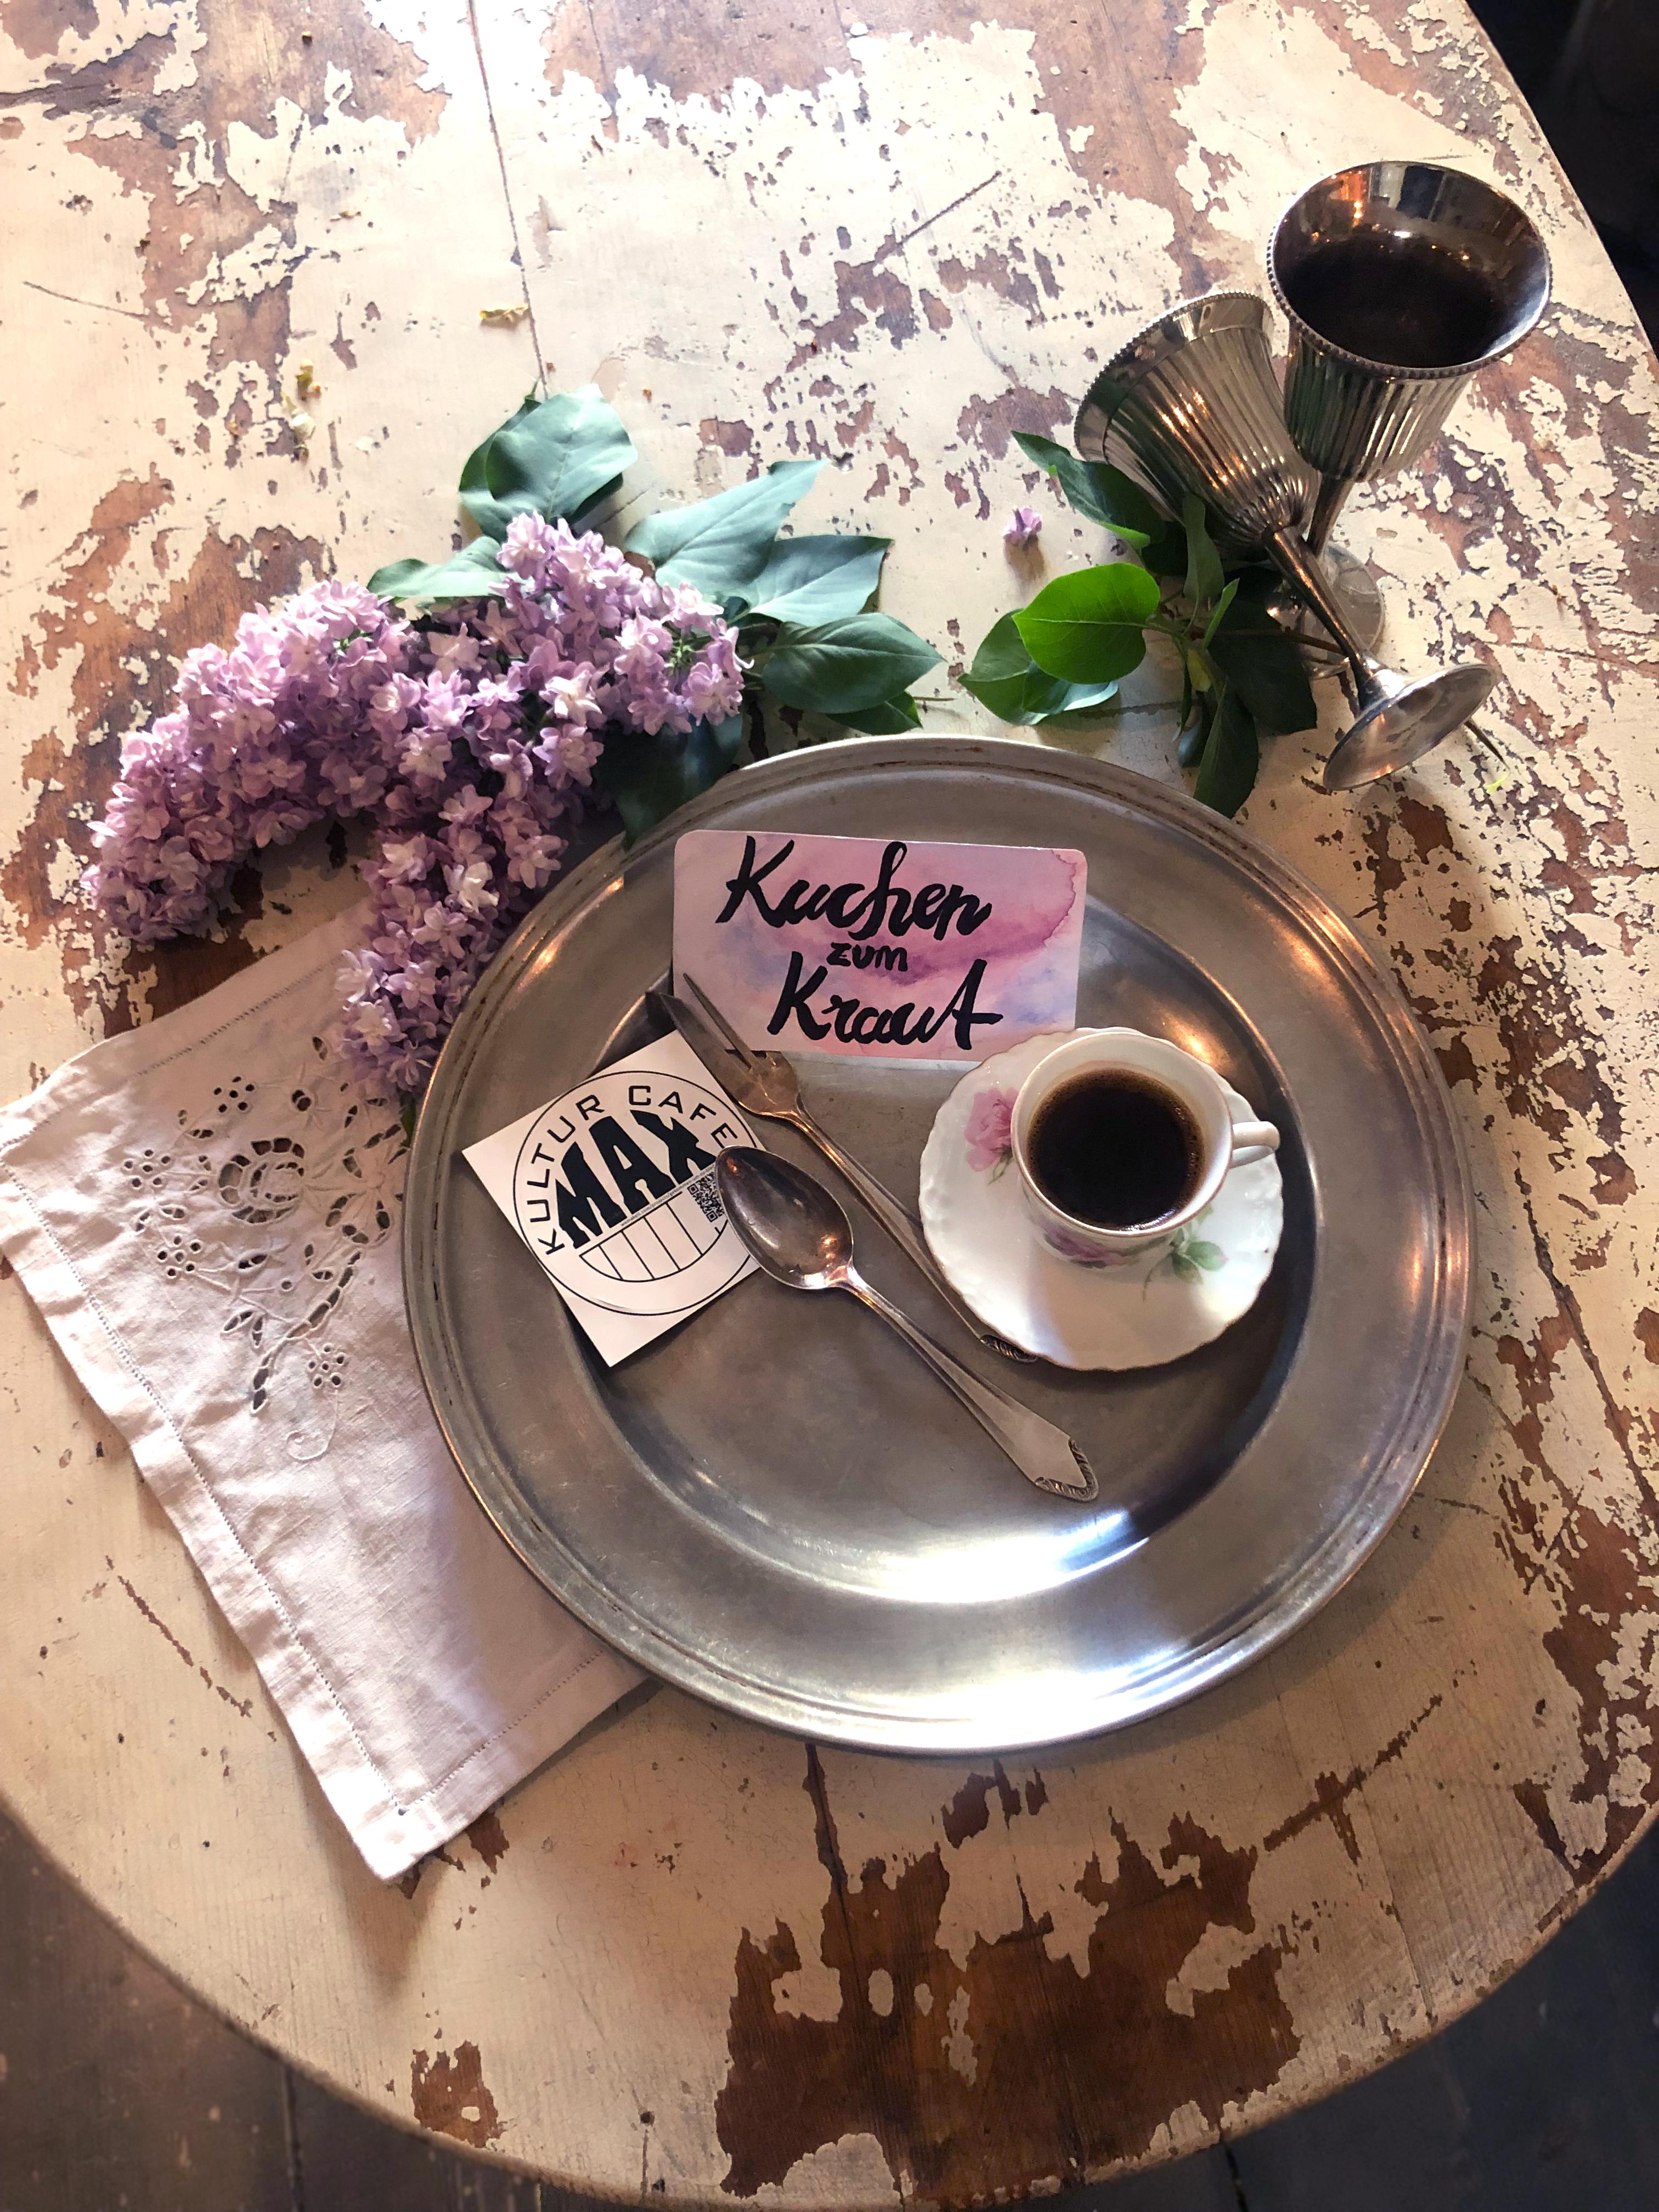 Kuchen zum Kraut - Crowdfundingparty for Kulturcafé Max